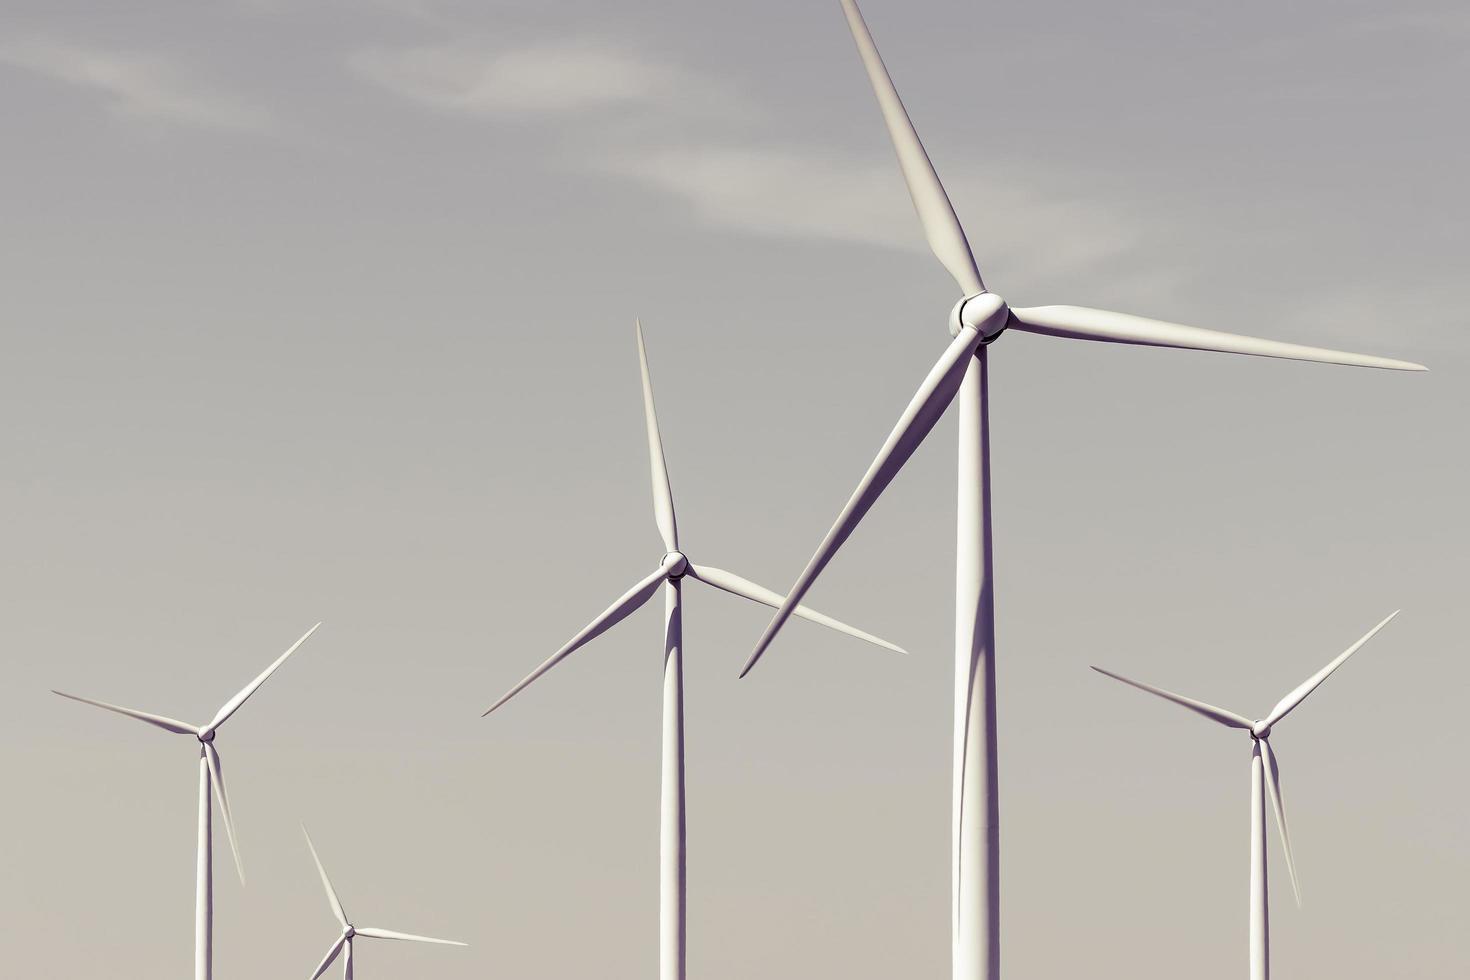 Windkraftanlagen gegen den Himmel foto